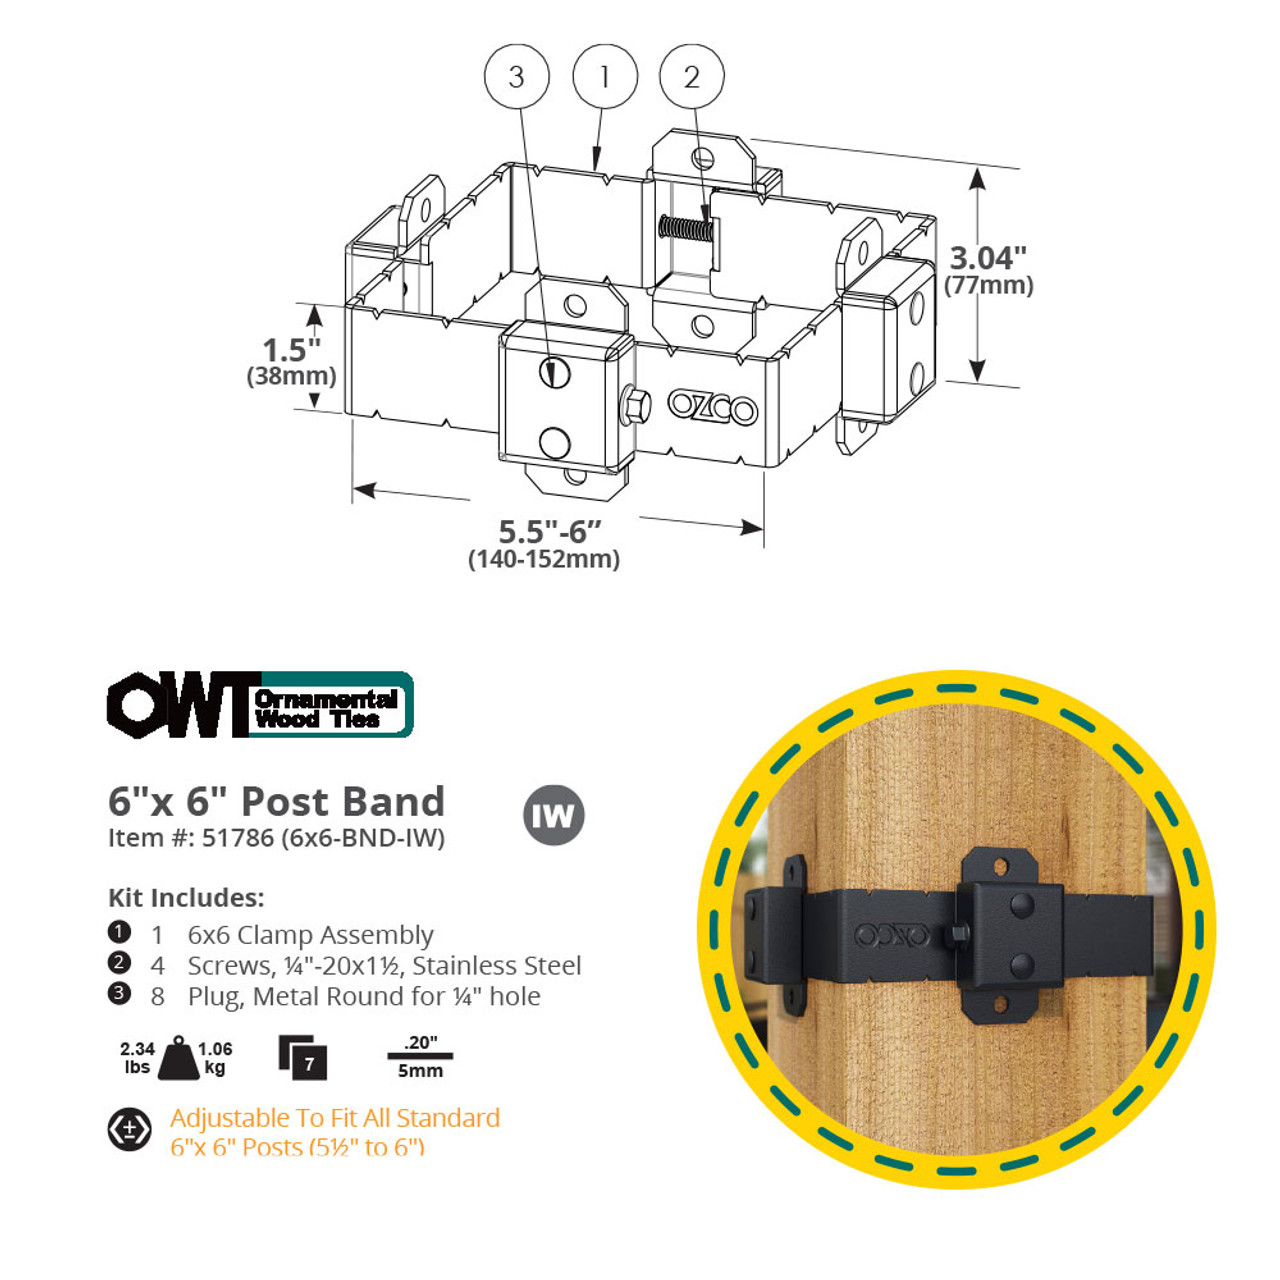 6 x 6 OZCO OWT Ironwood Post Band Spec Drawing